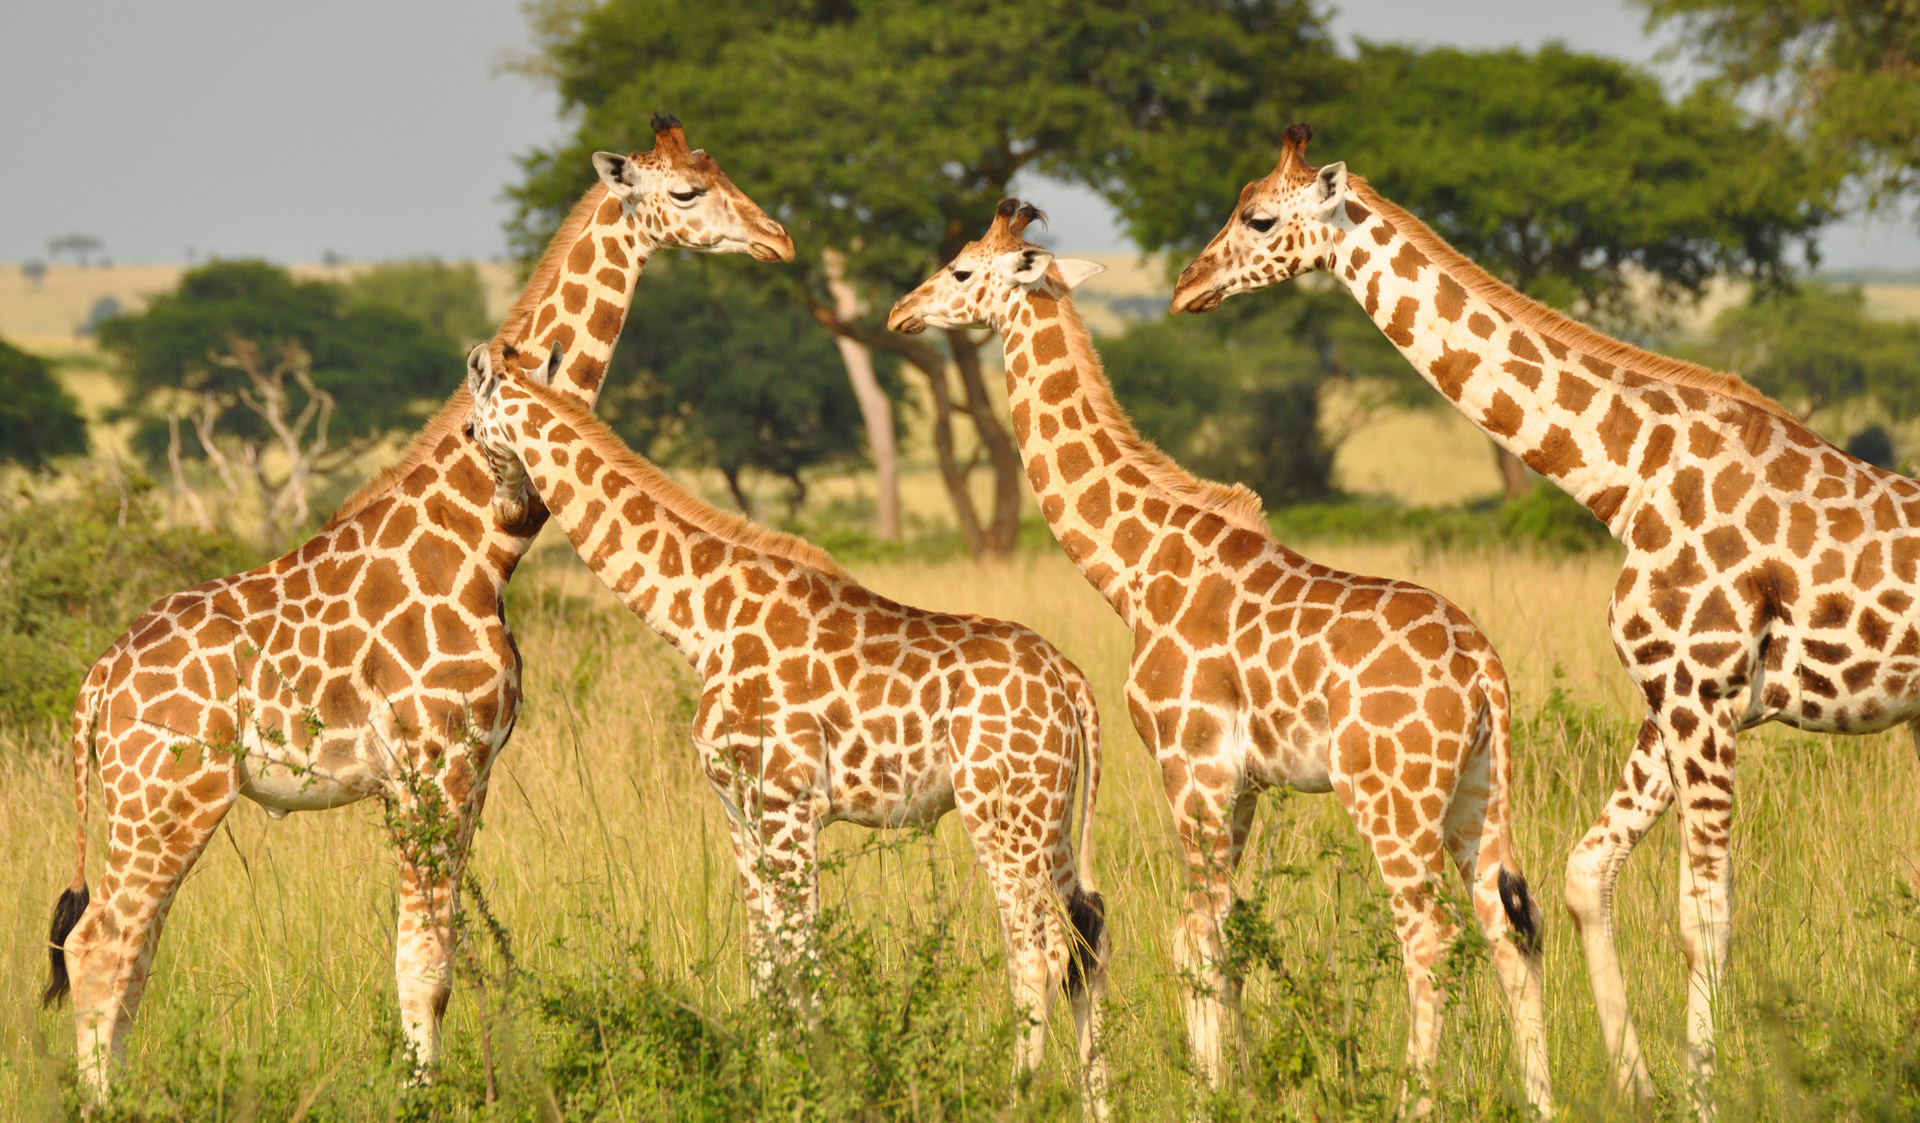 Nubian giraffe herd in Murchison Falls National Park, Uganda